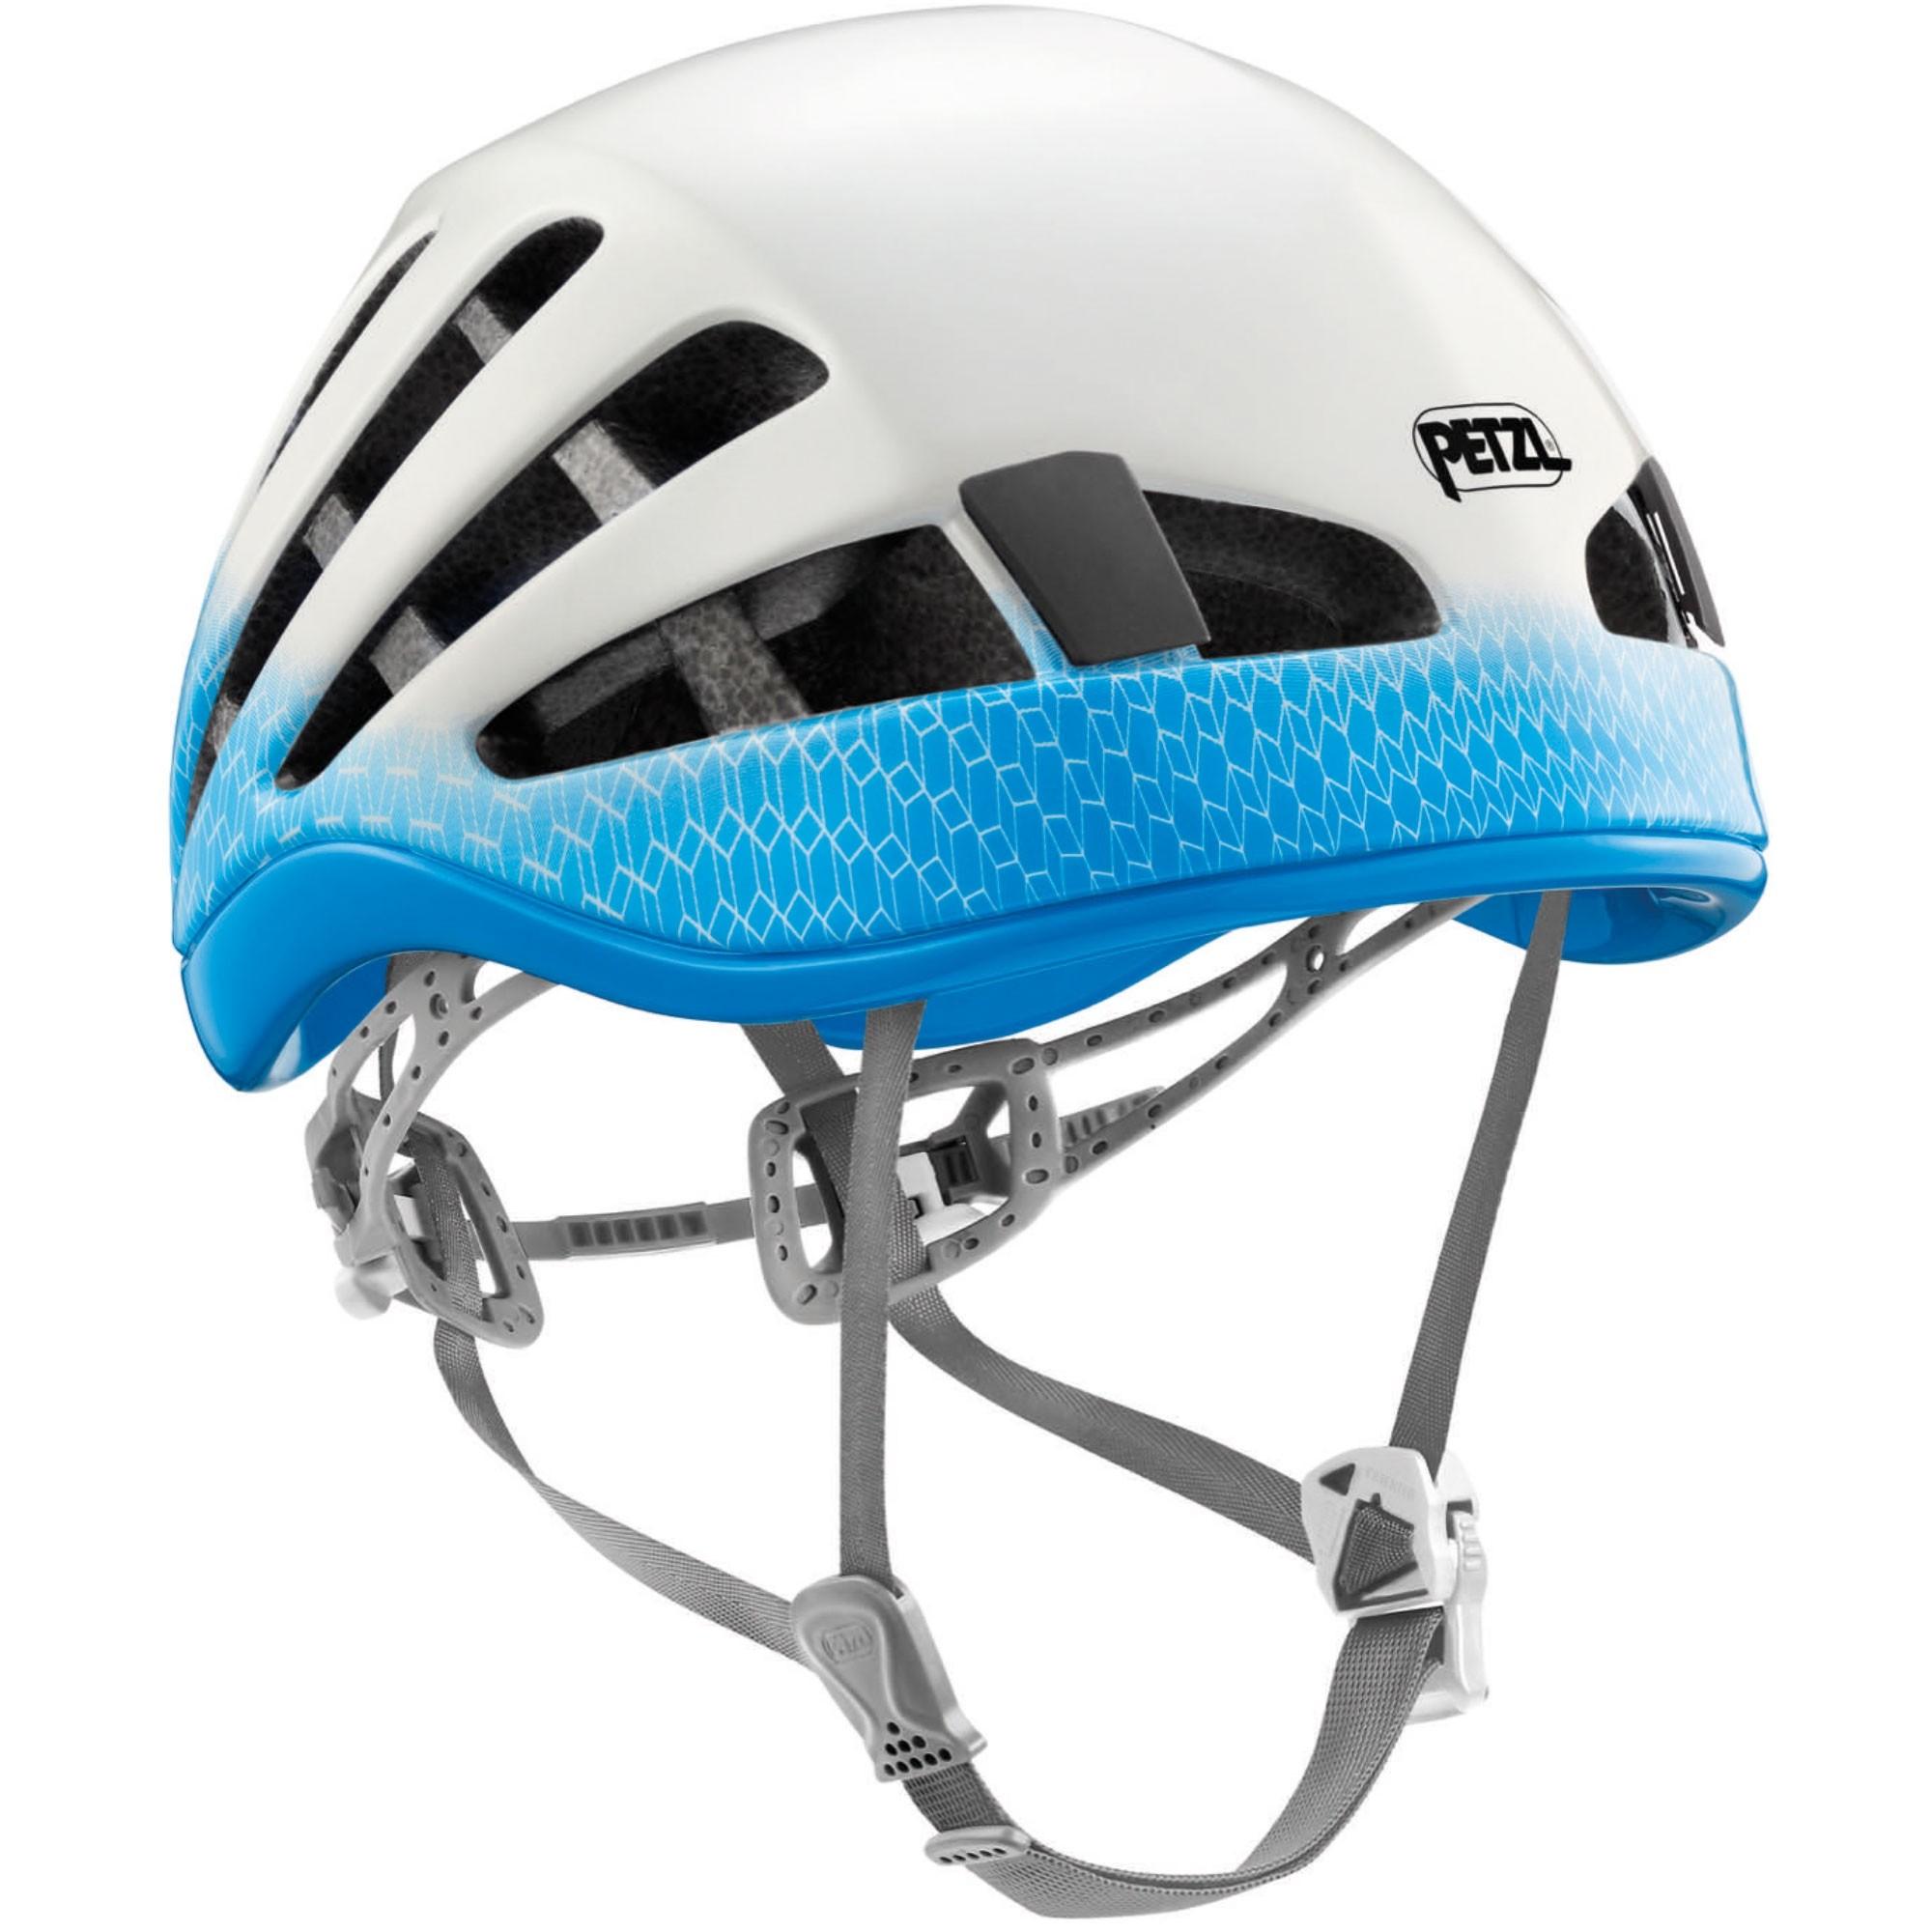 Petzl Meteor Climbing Helmet - Blue